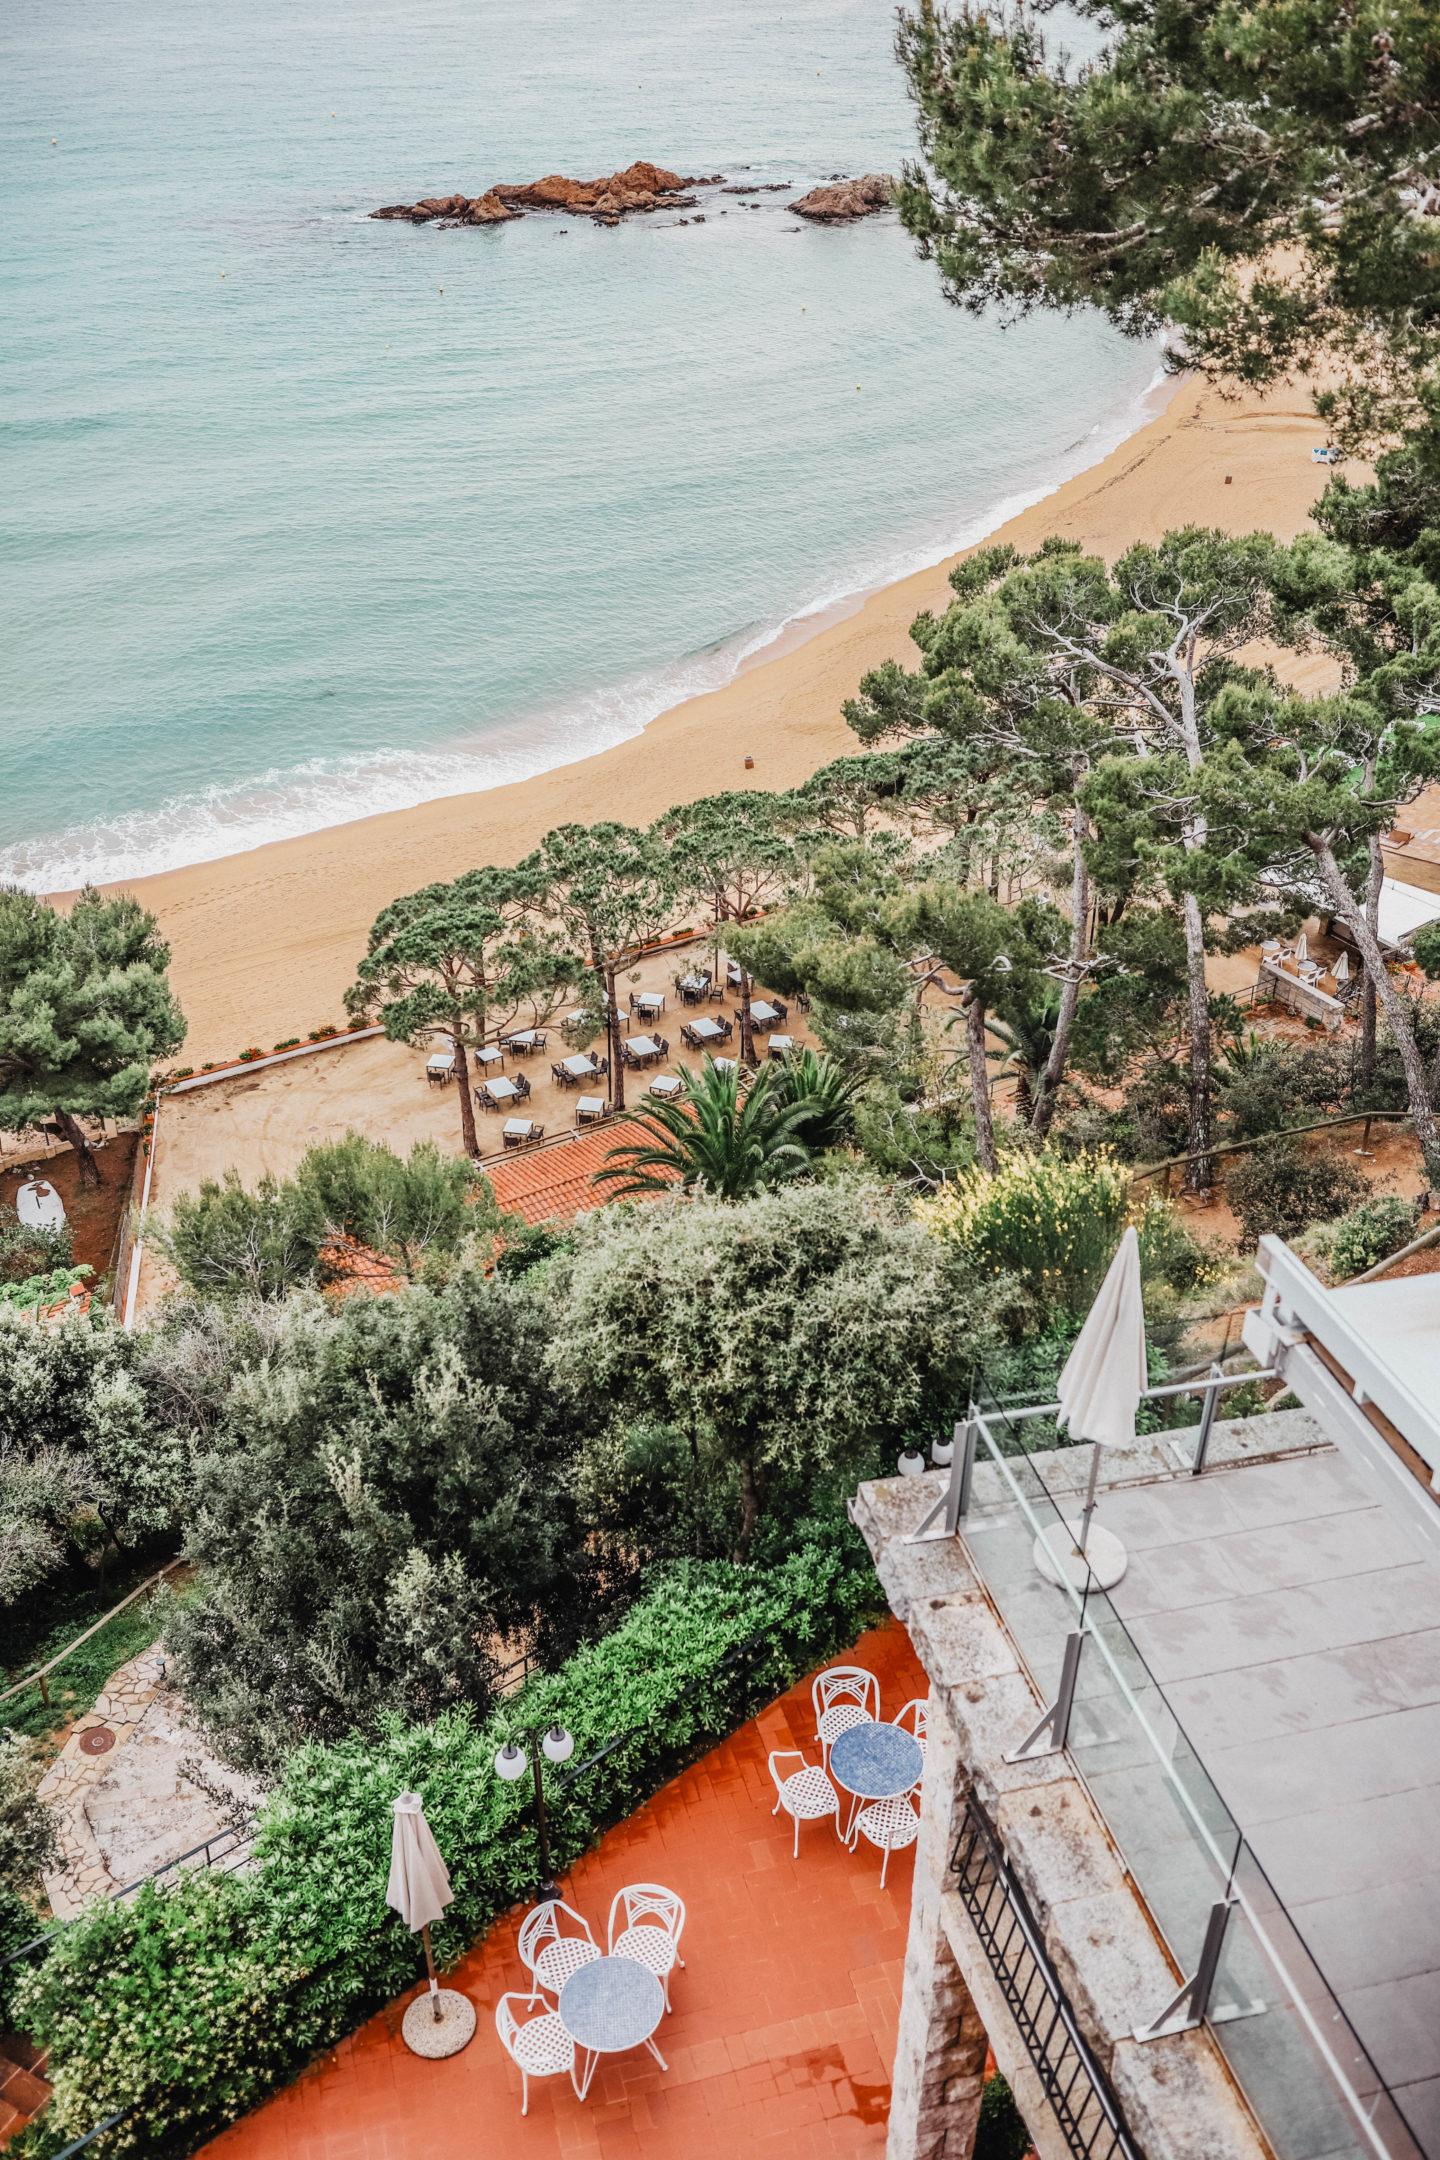 Hotel Santa Marta marie and mood